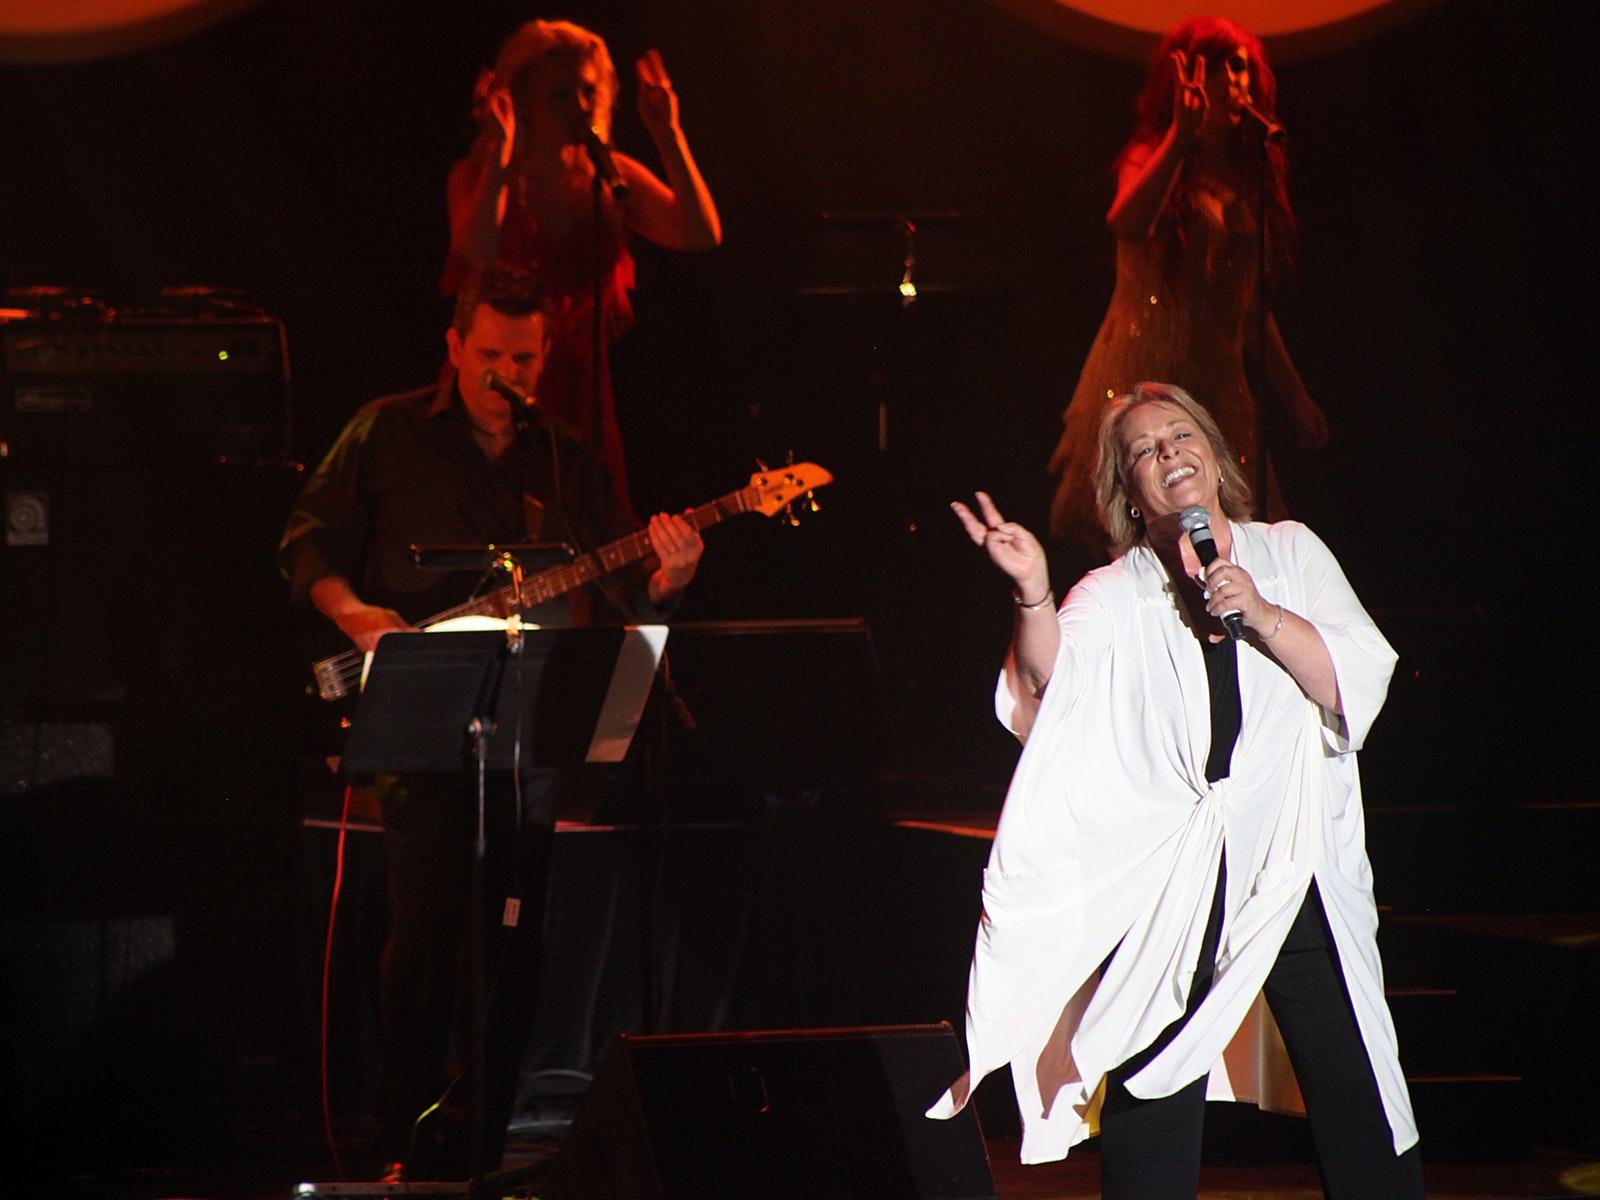 Colleen Hewett on stage